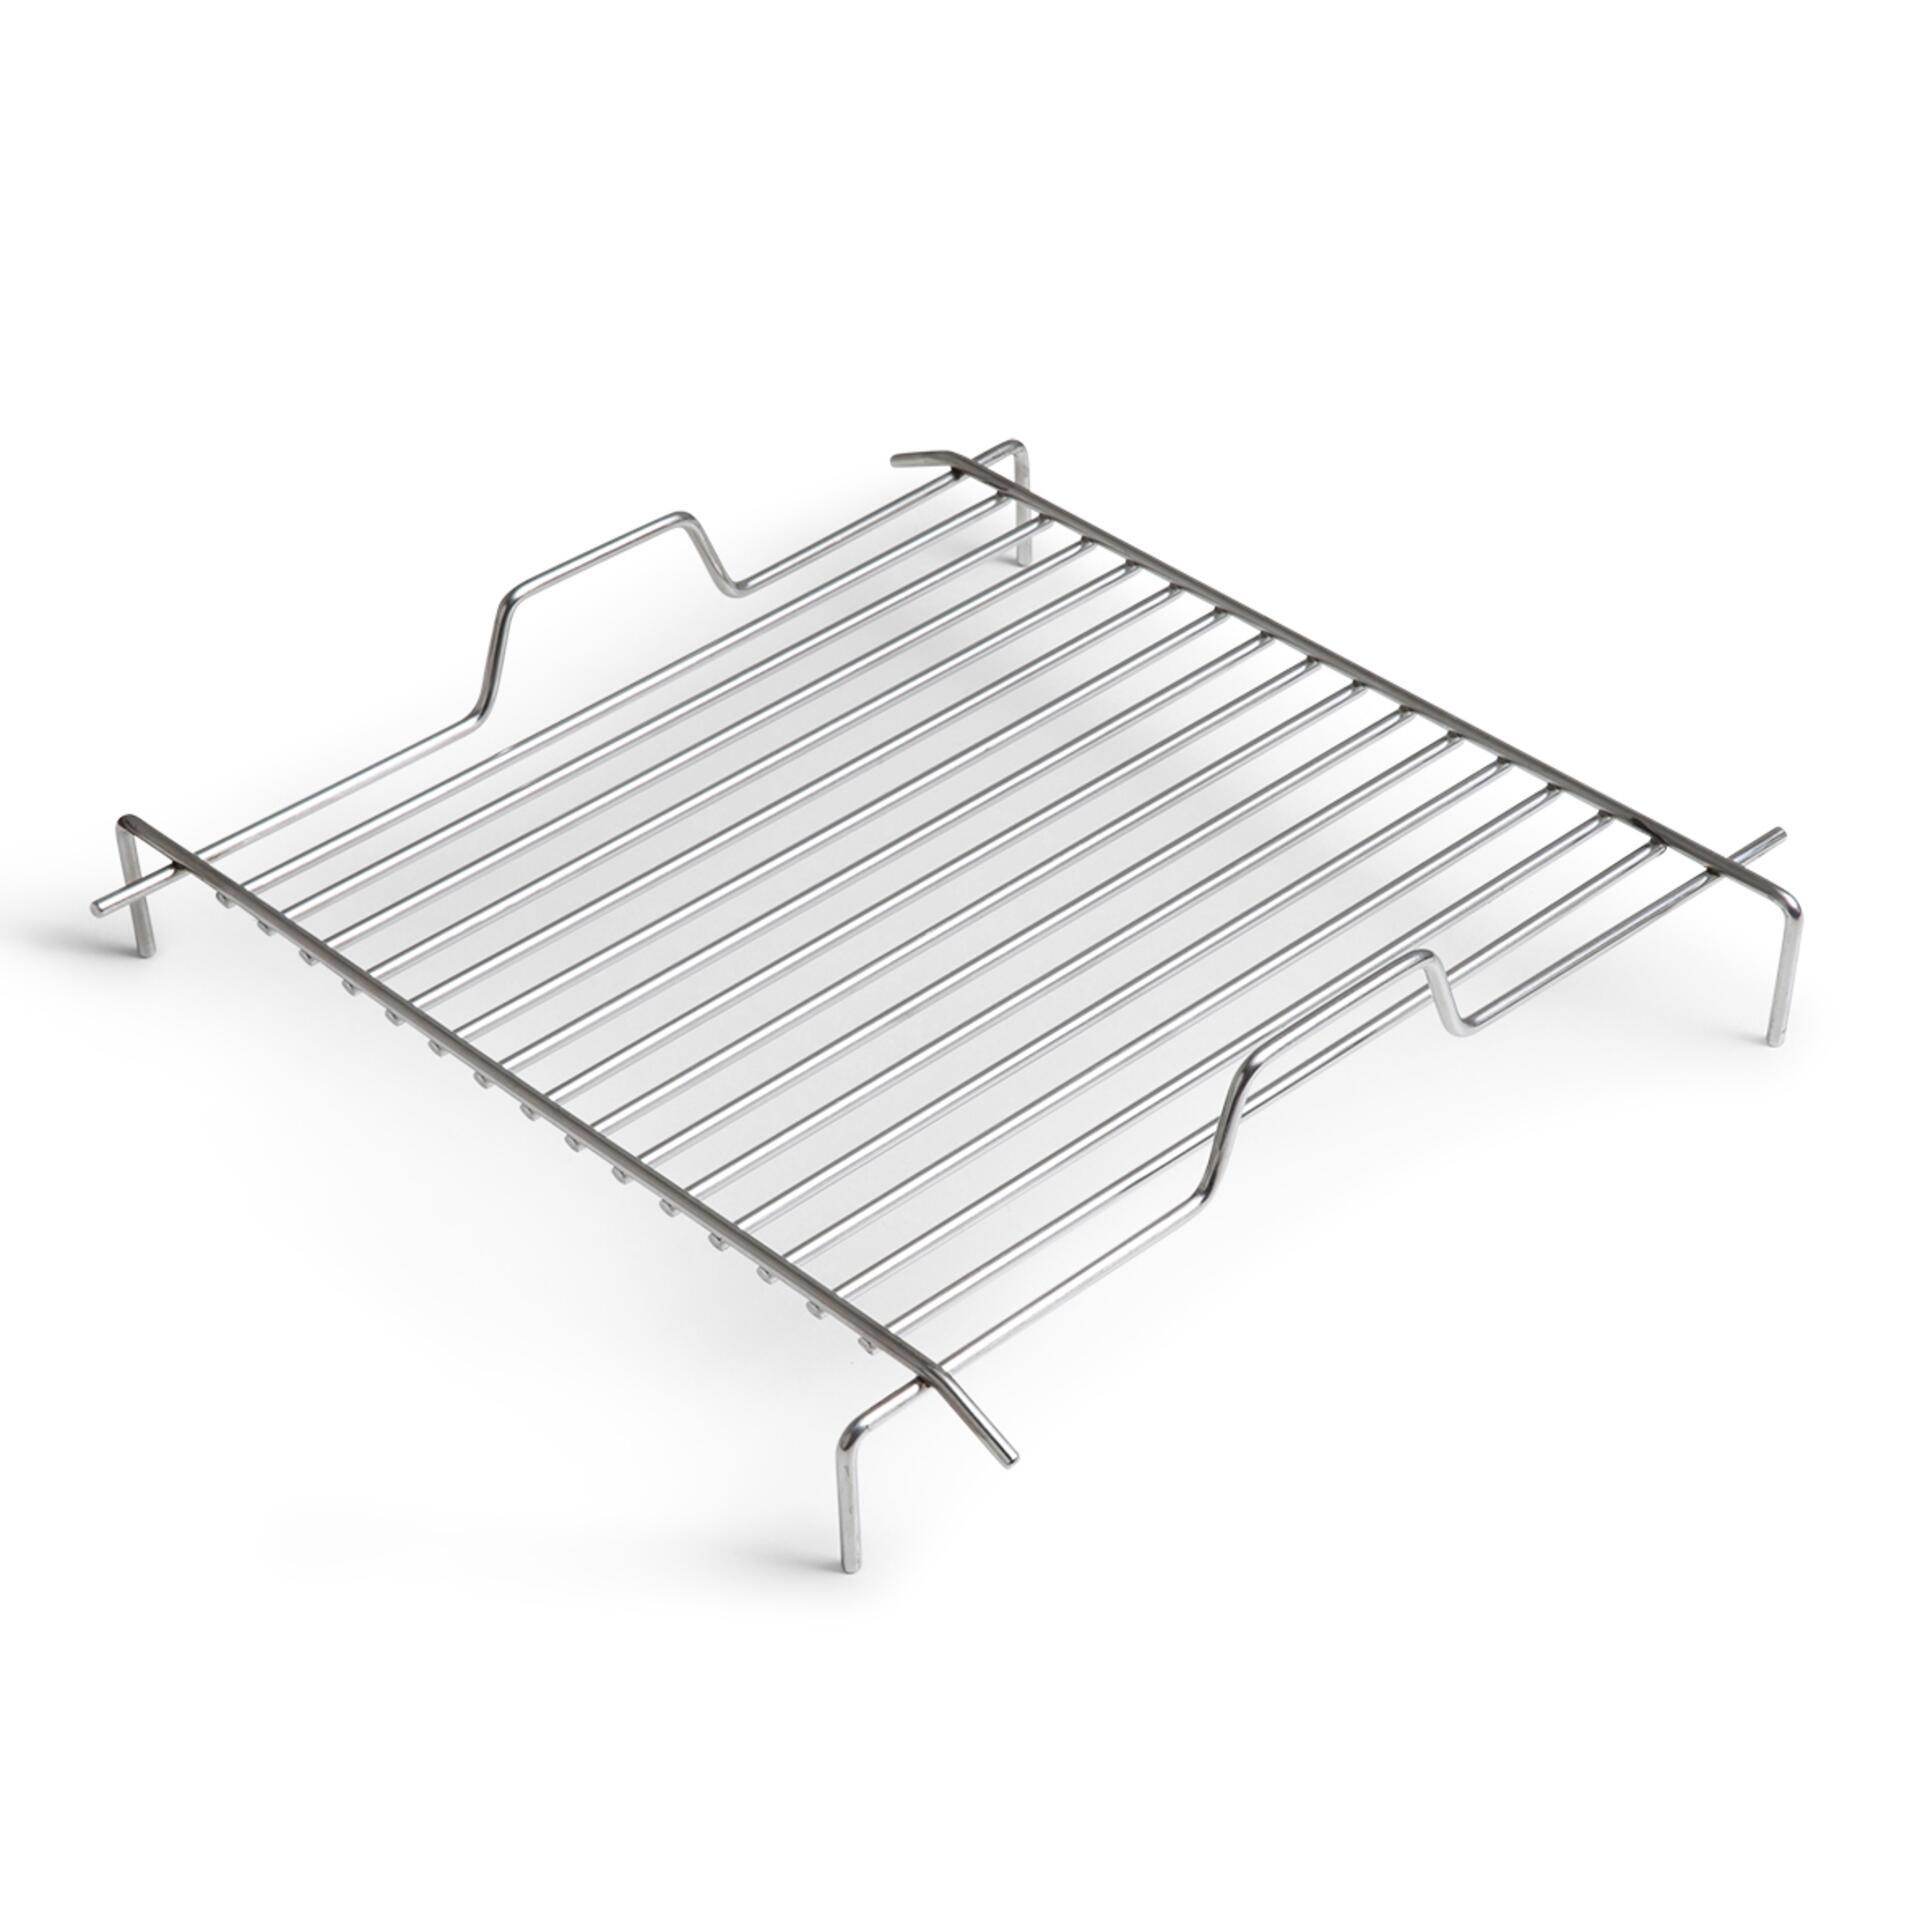 Höfats Cube Grillrost